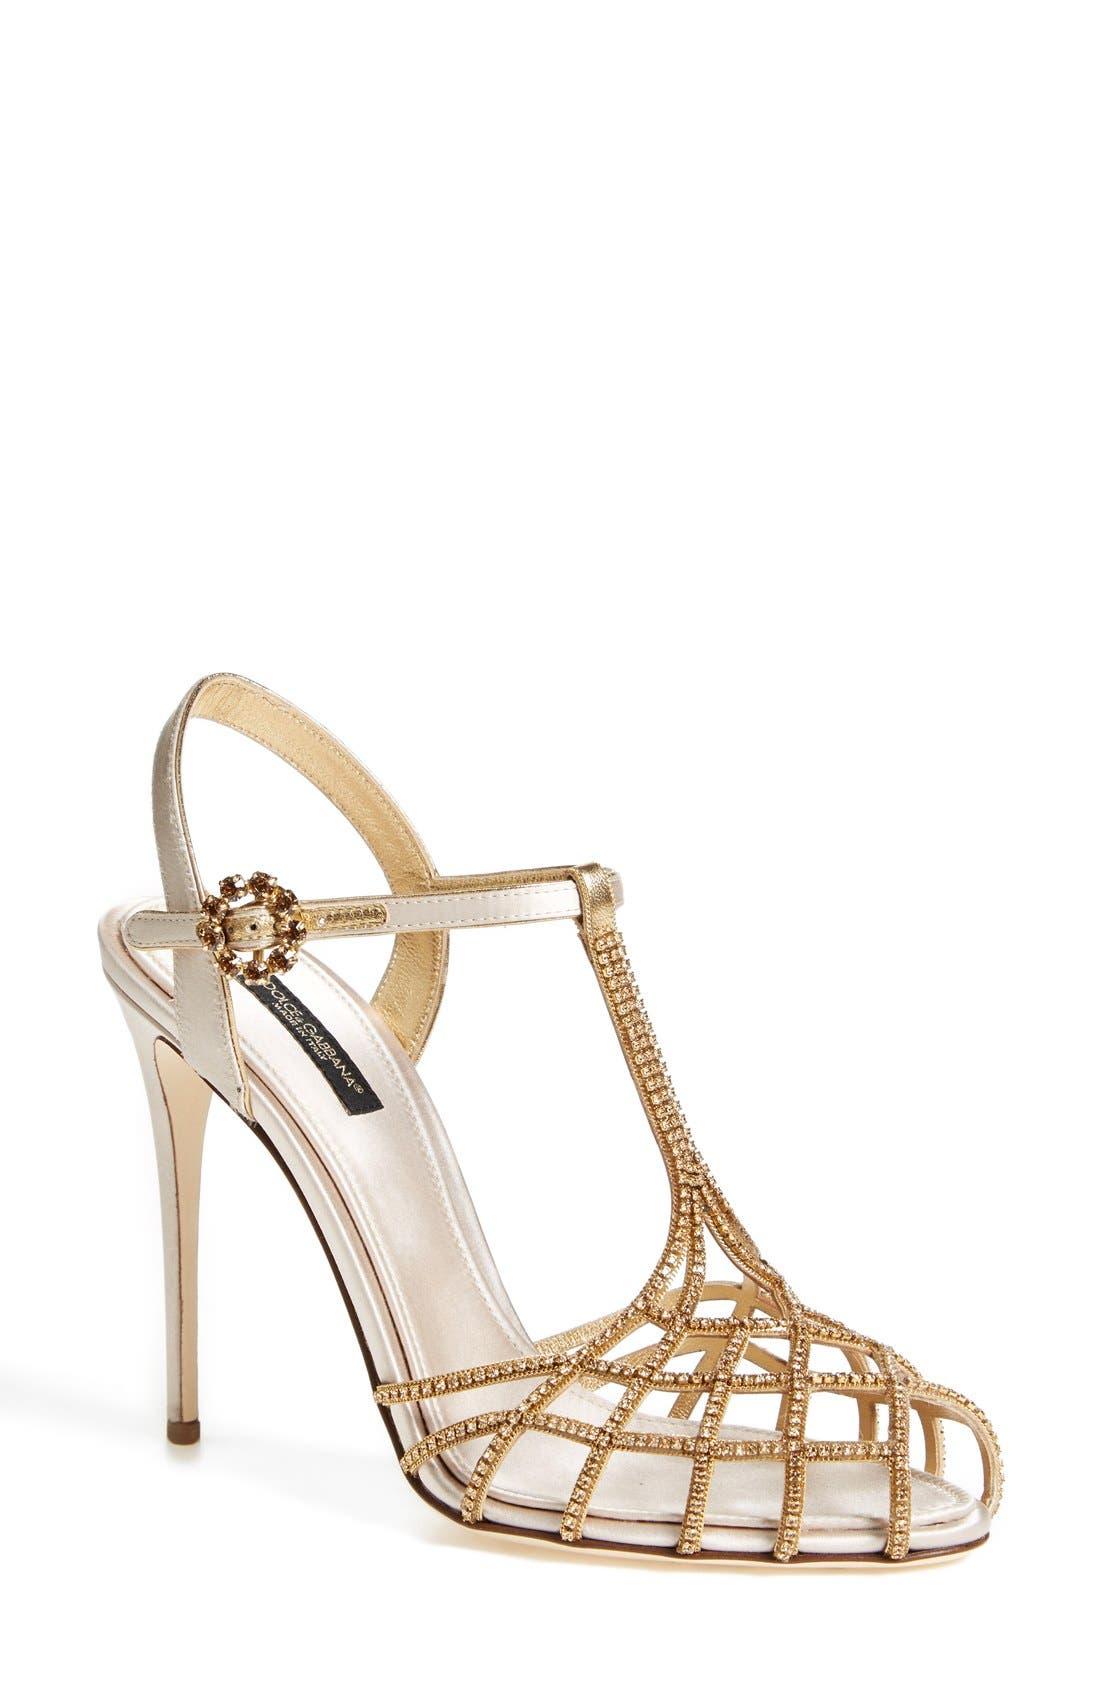 Alternate Image 1 Selected - Dolce&Gabbana Crystal T-Bar Sandal (Women)